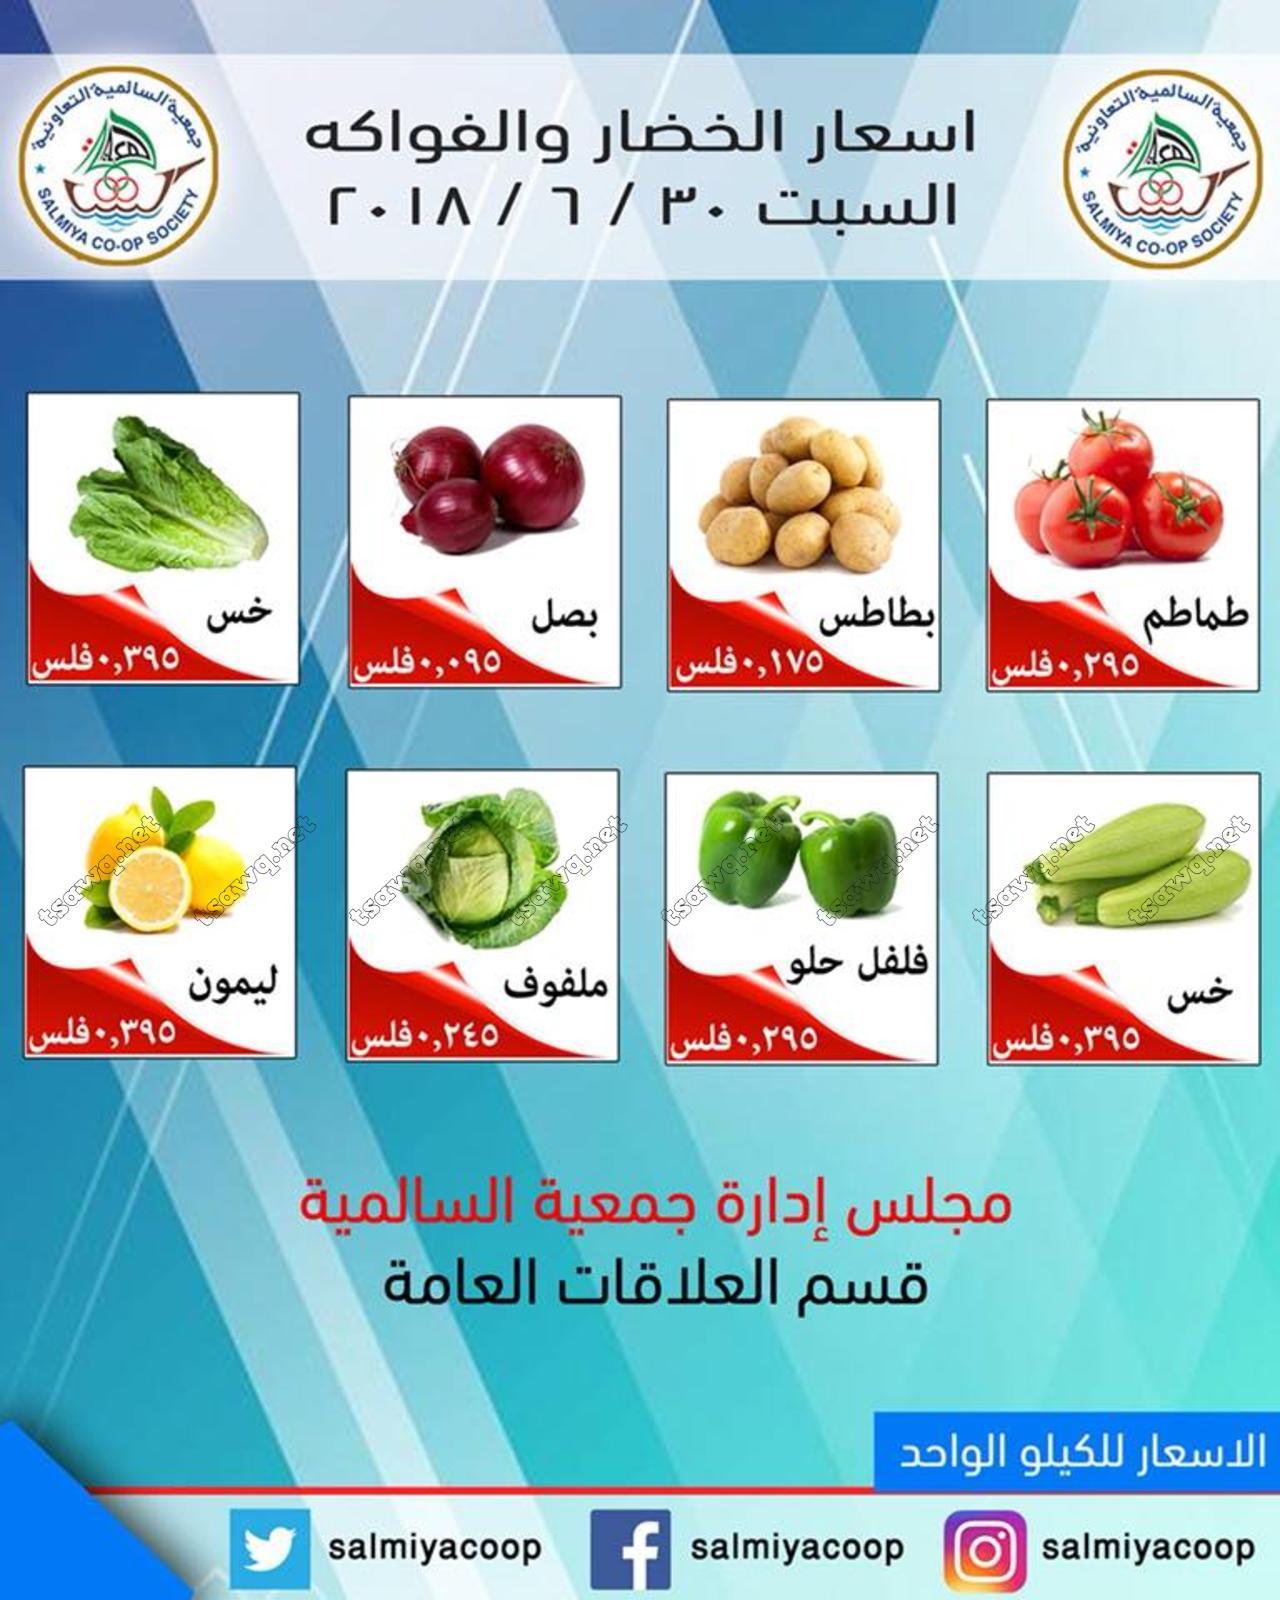 9d29ca42bfb75 عروض جمعية السالمية التعاونية الكويت فقط السبت 30 يونيو 2018